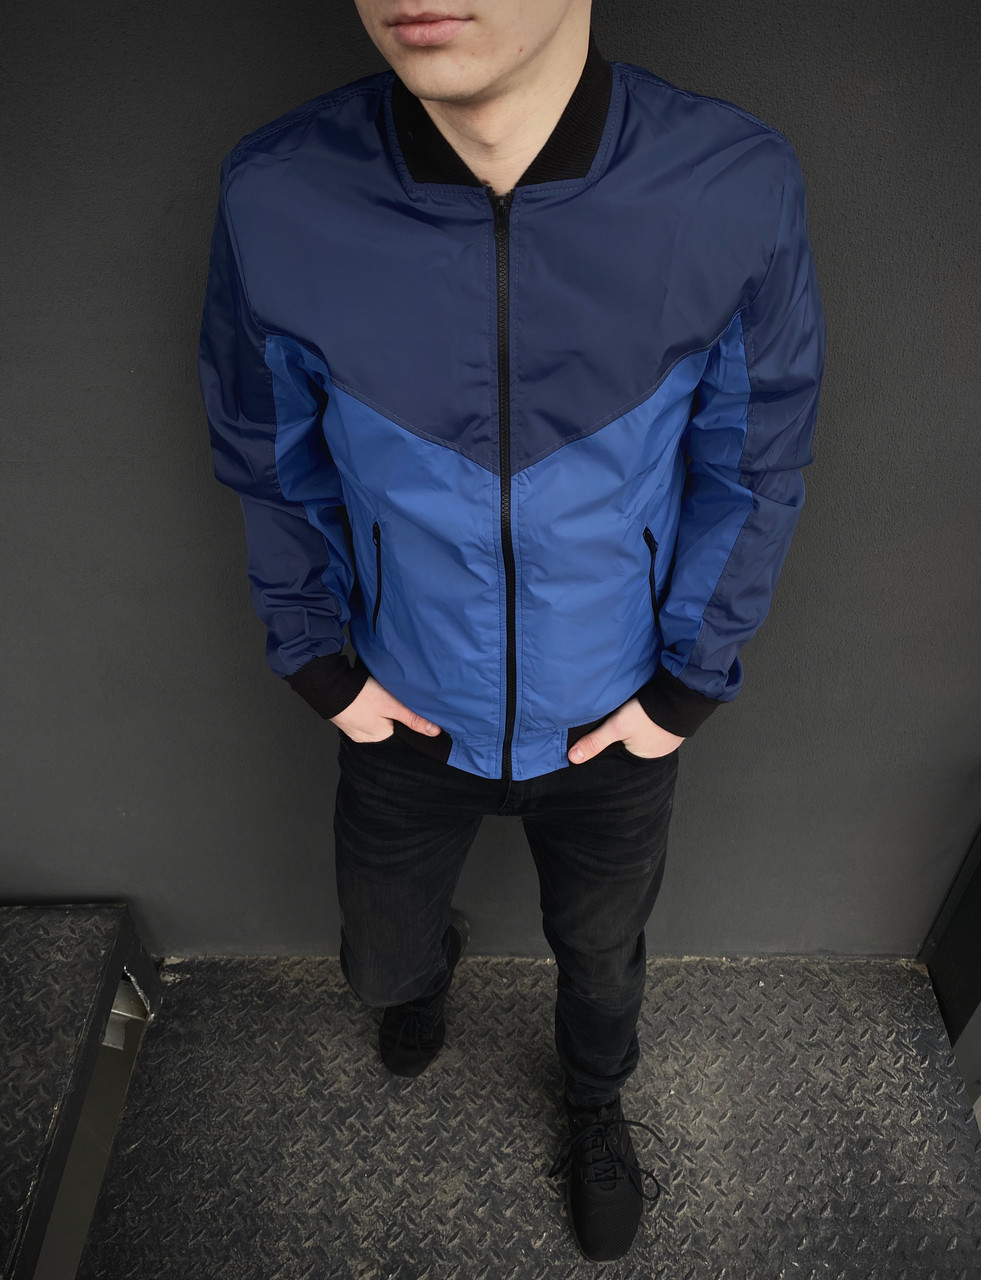 Курктка бомбер мужской Intruder синий двухцветный весенний S M L XL XXL